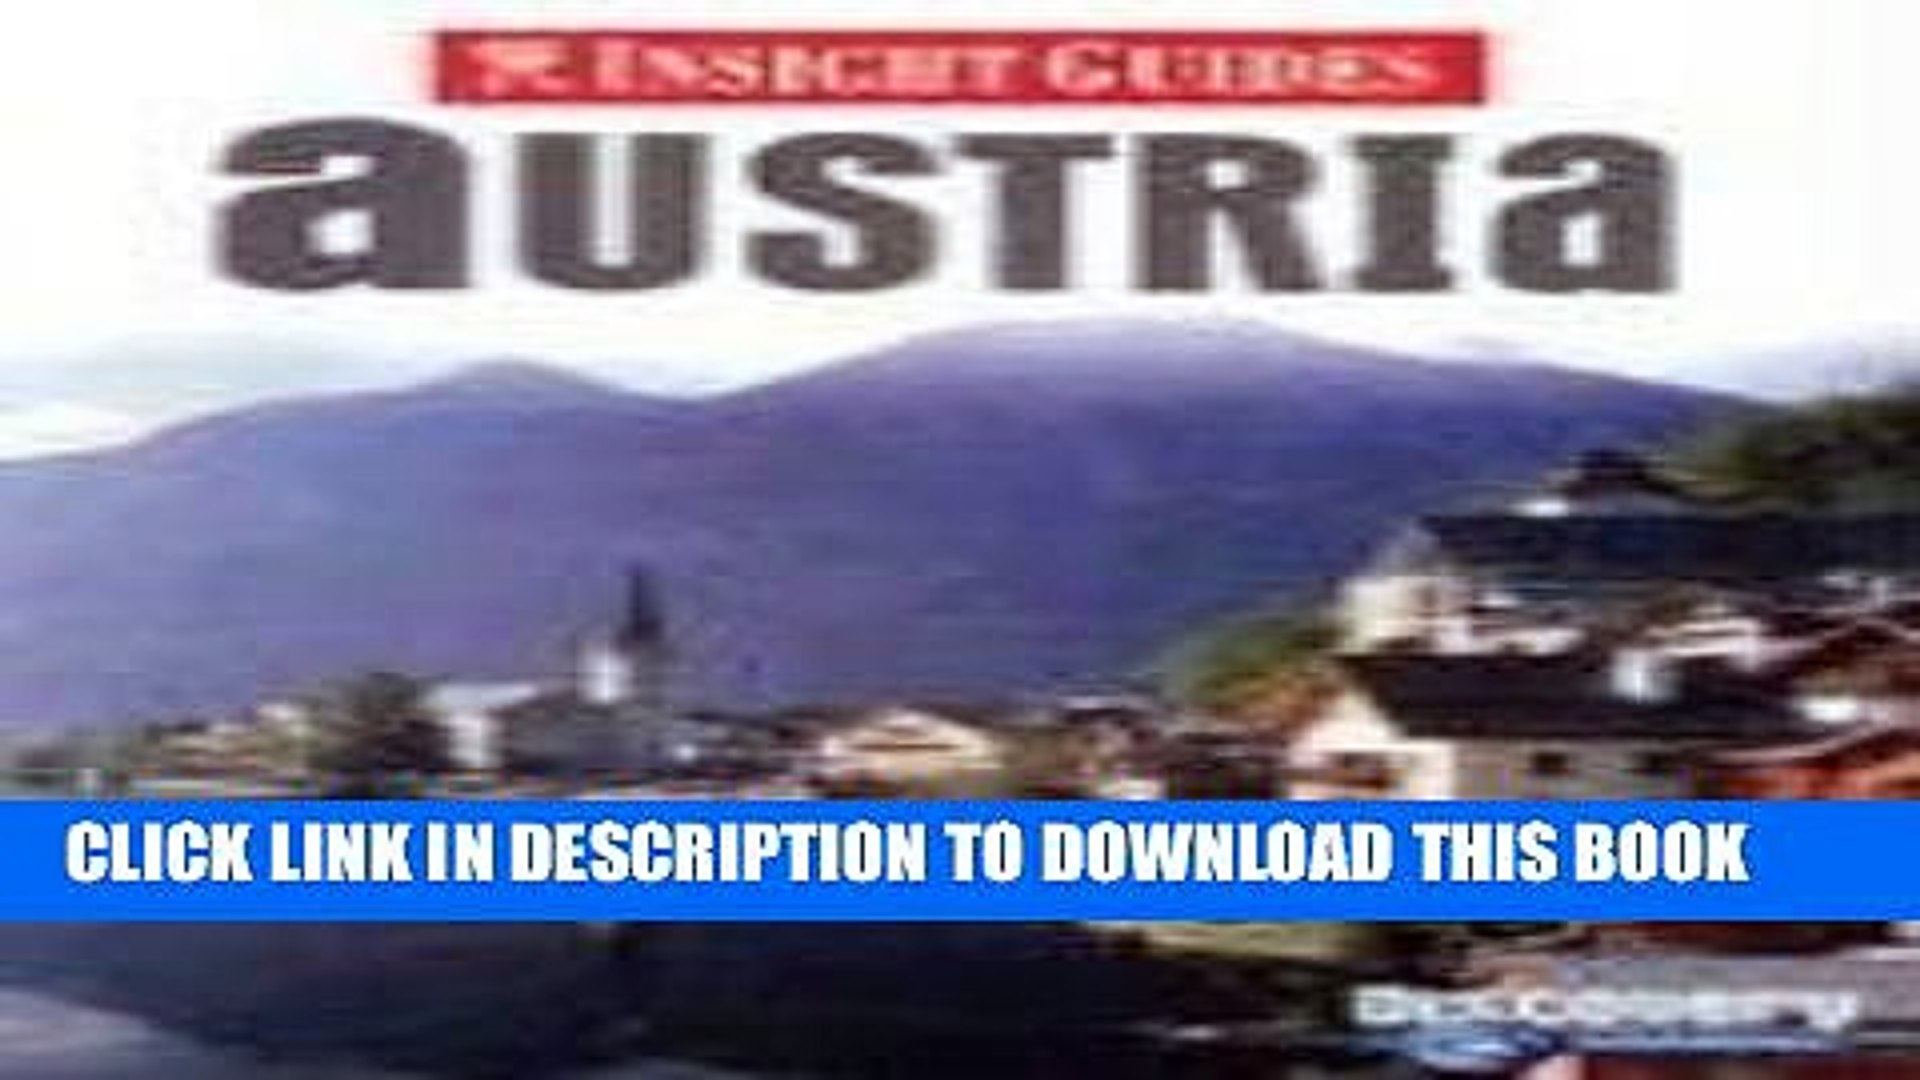 [New] Insight Guides Austria (Insight Guide Austria) Exclusive Full Ebook